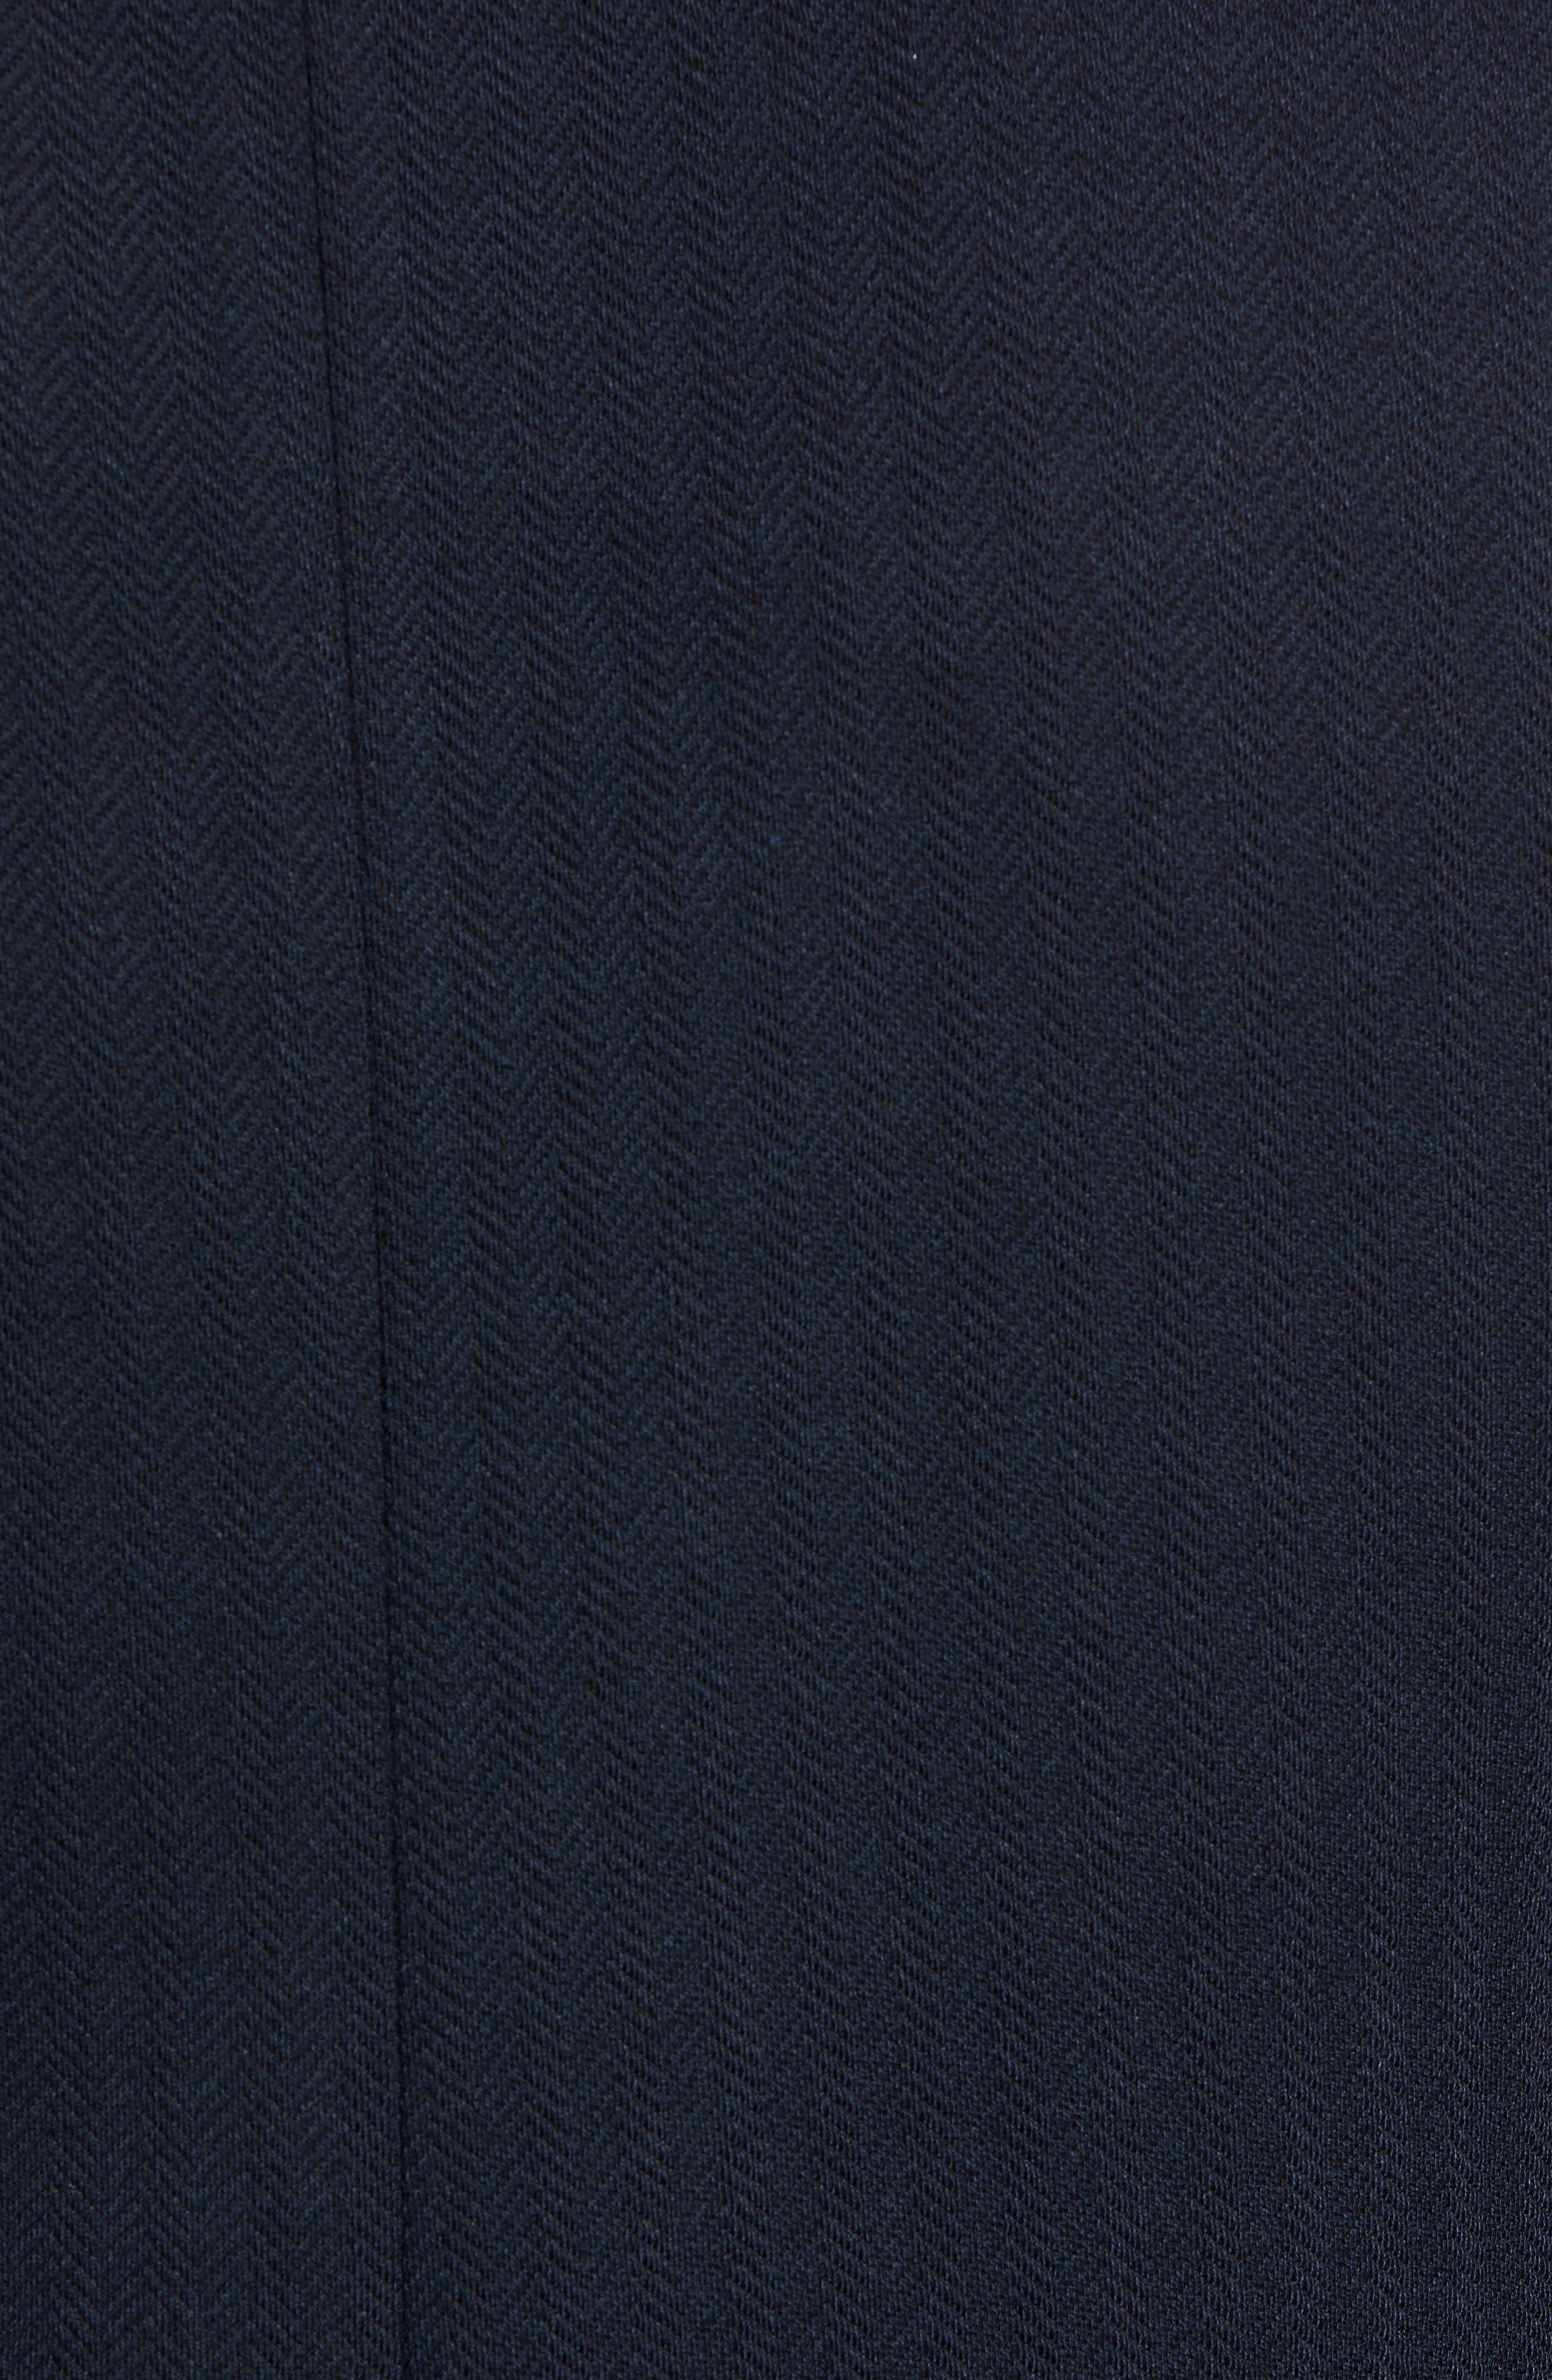 Glenny Slim Fit Layered Look Blazer,                             Alternate thumbnail 6, color,                             NAVY